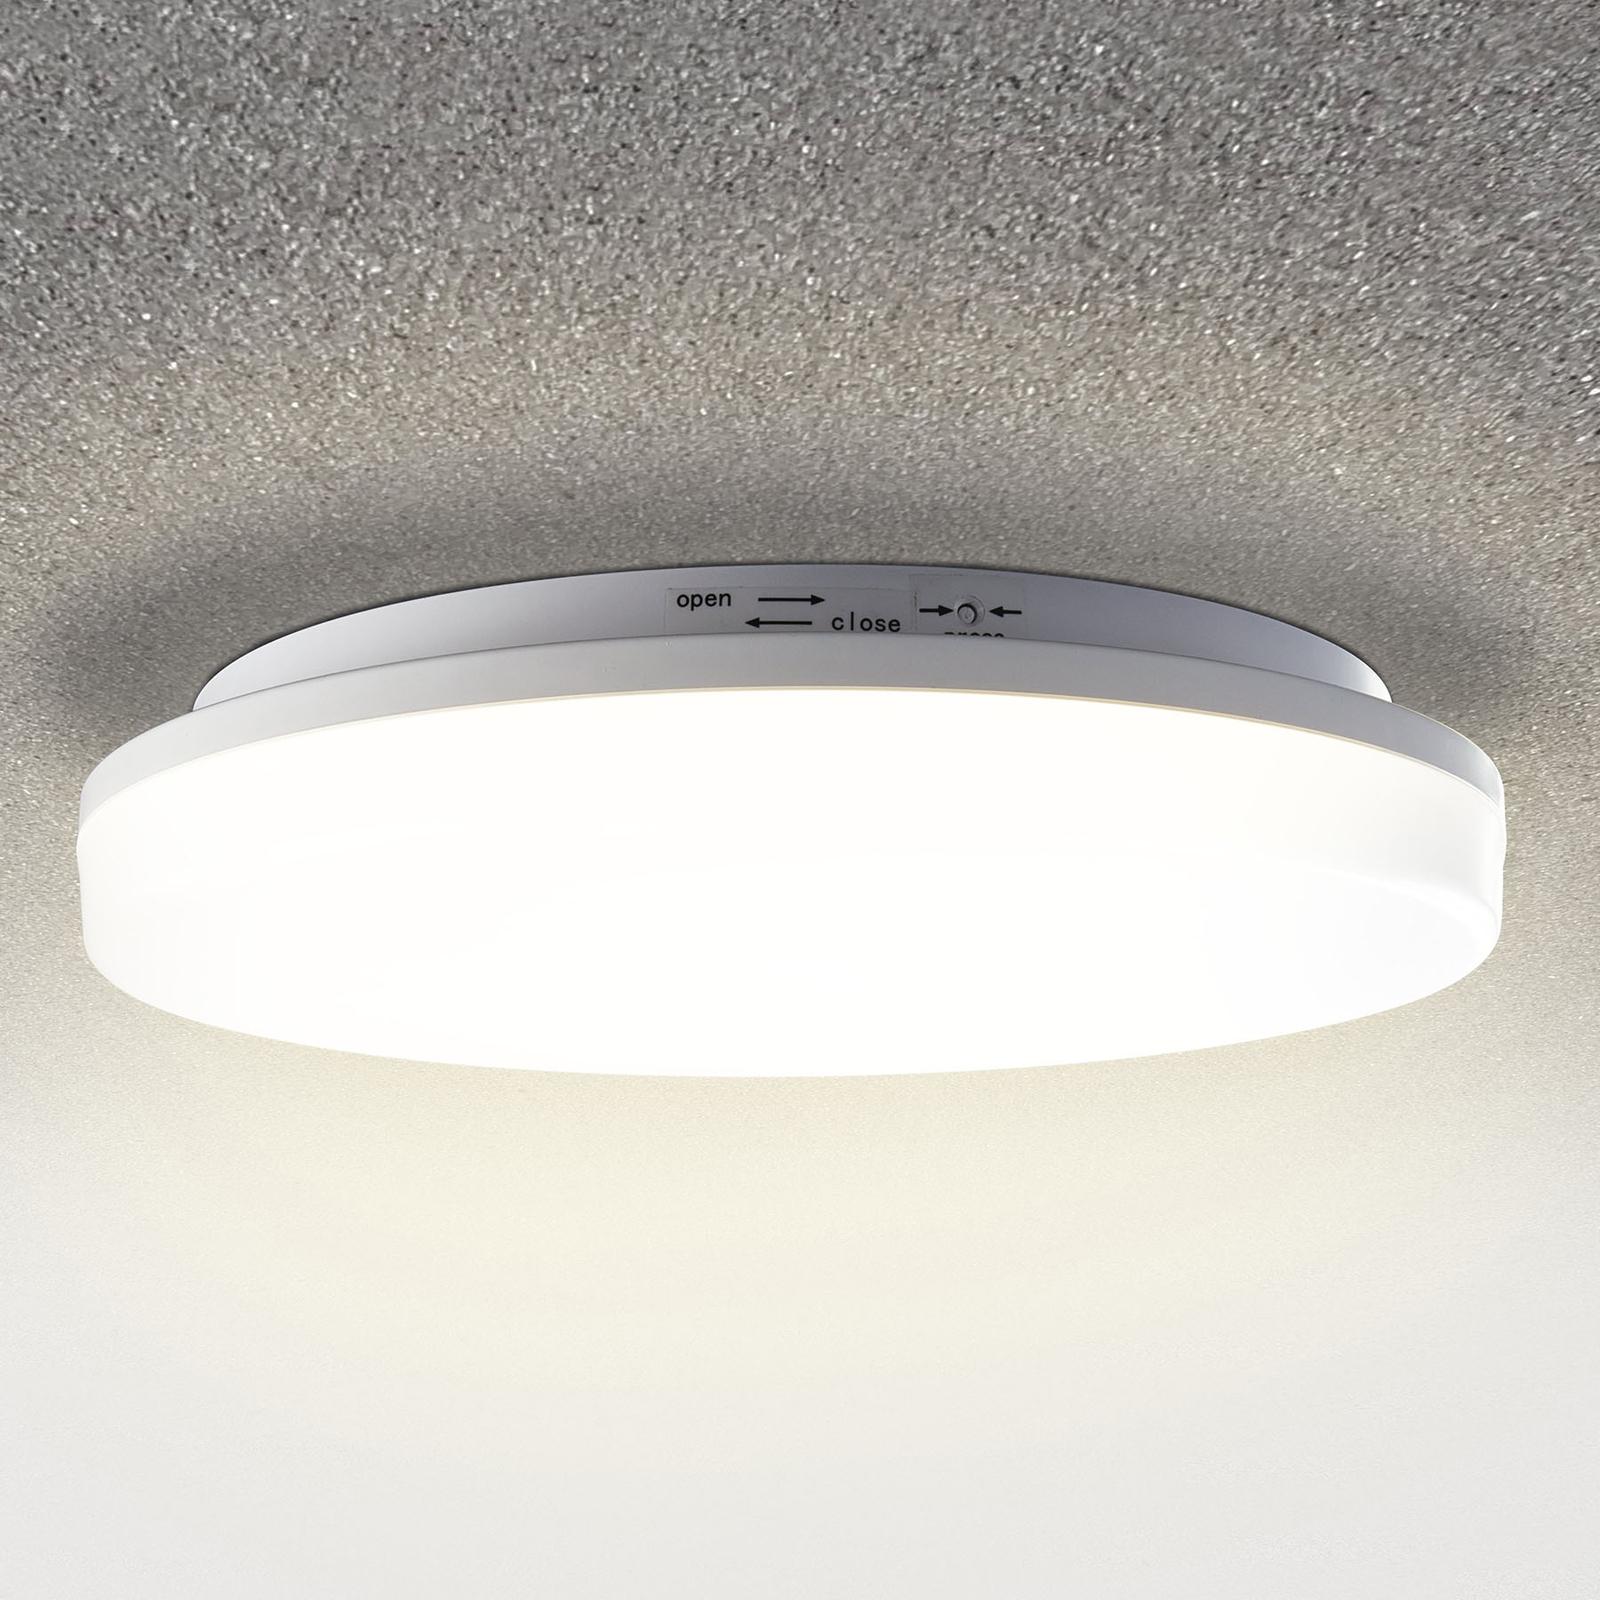 LED-taklampe med Pronto med bevegelsessensor